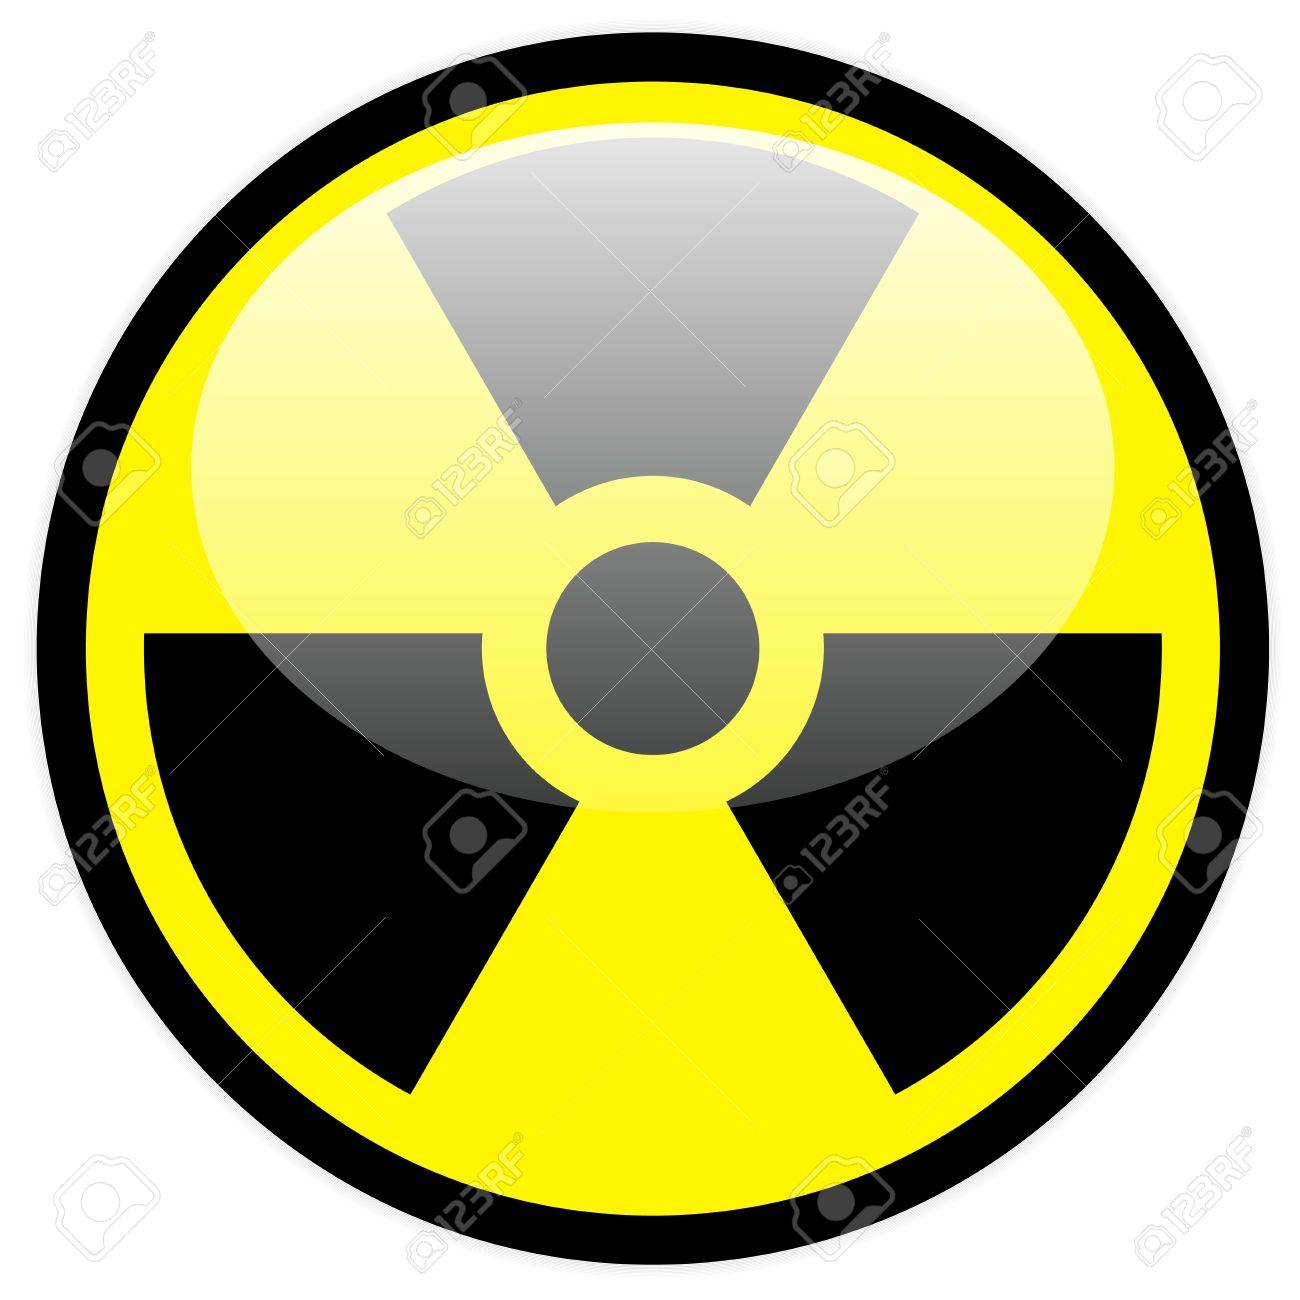 vector radiation symbol royalty free cliparts vectors and stock rh 123rf com radiation clipart clip art radiation symbol